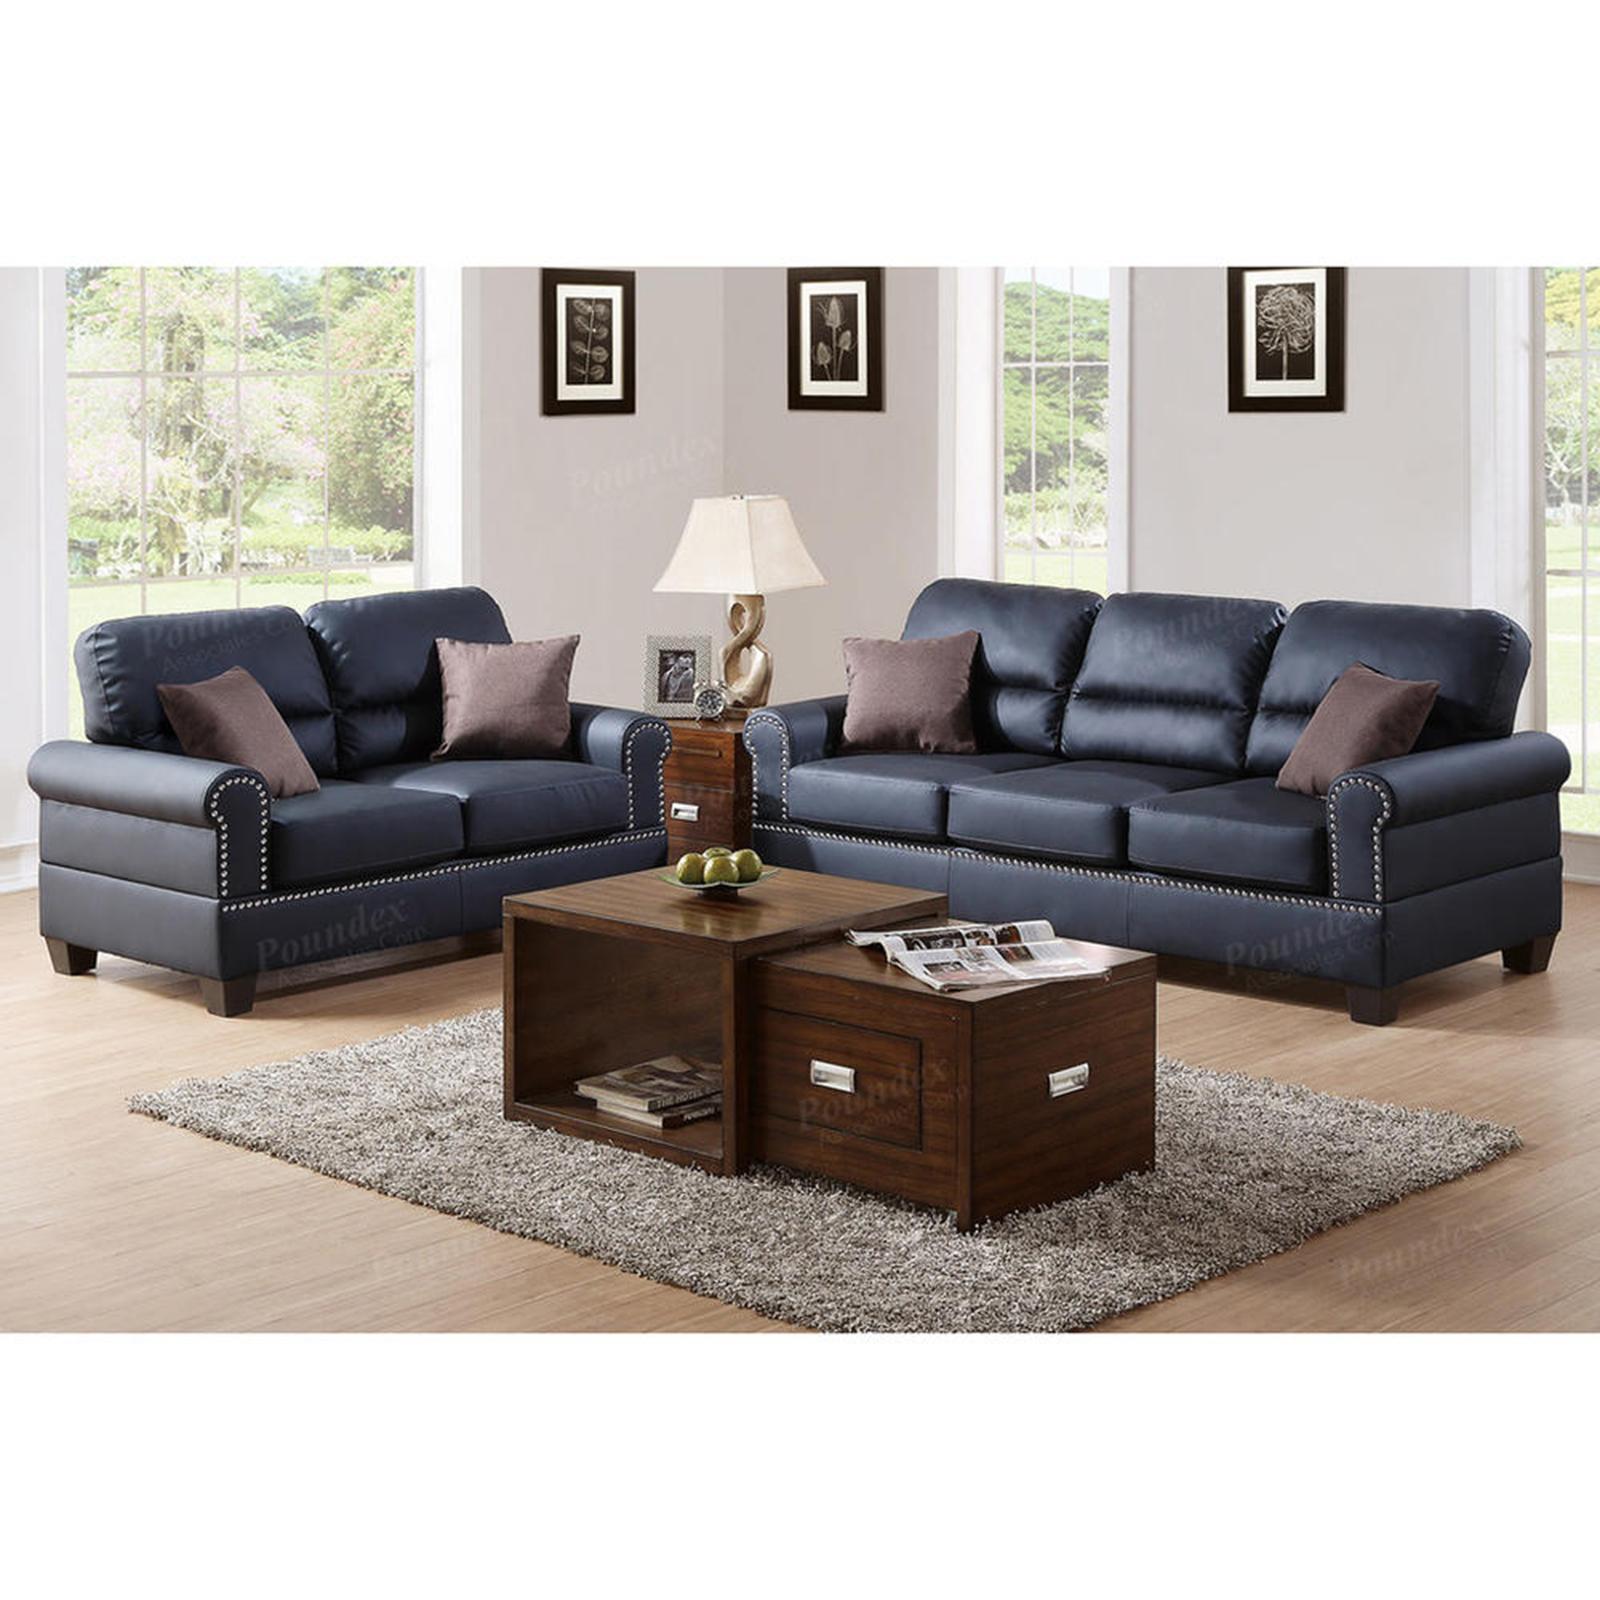 Furniture Design Sofa Set